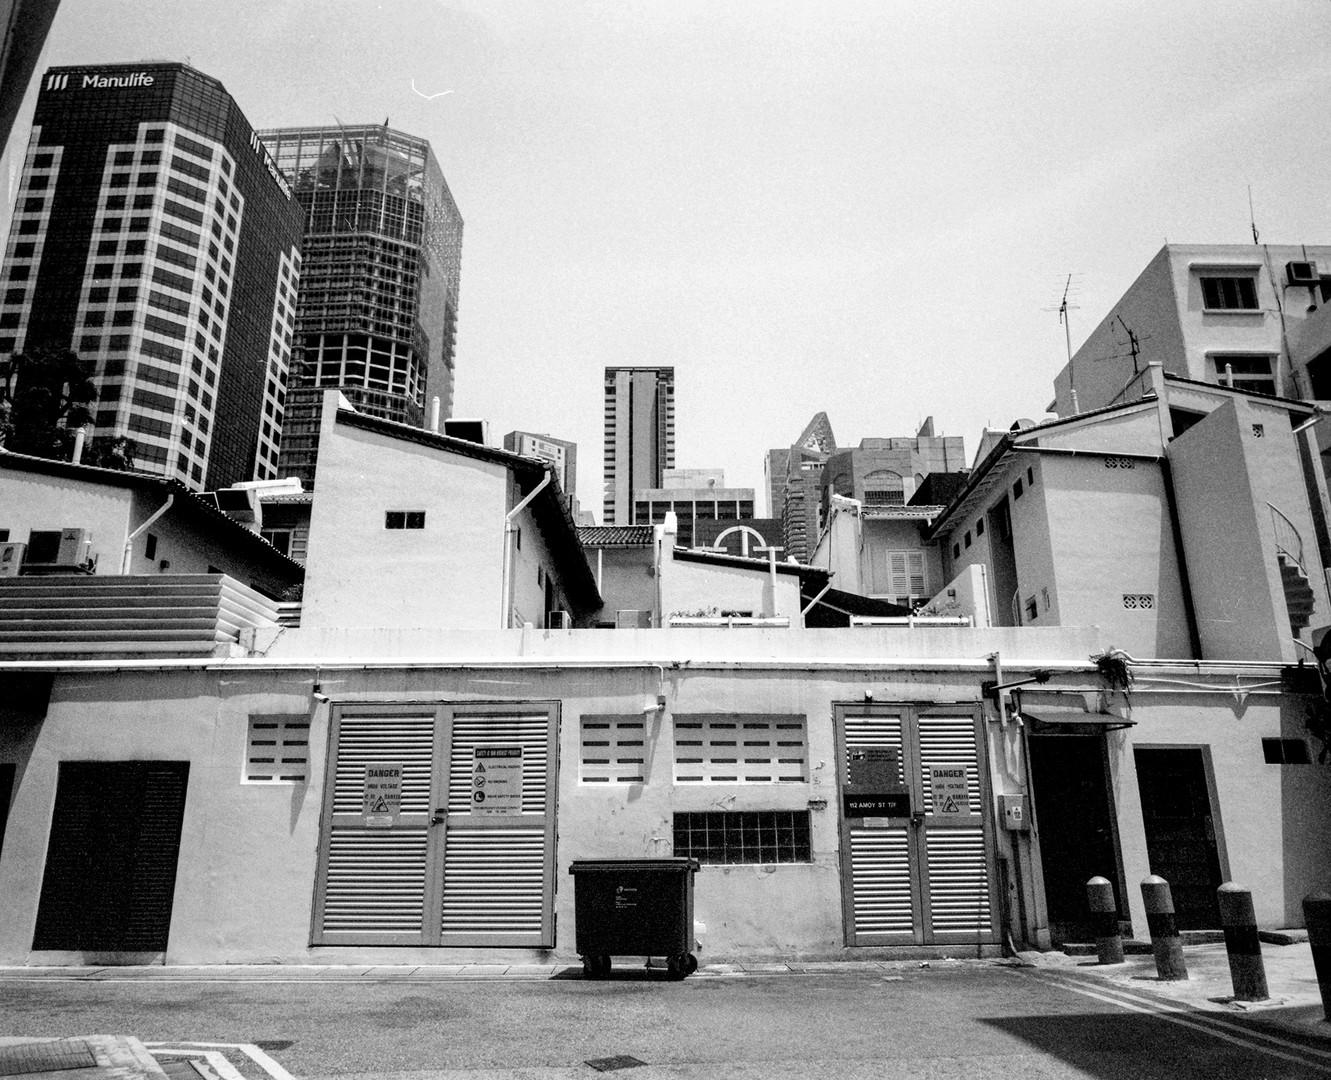 Goodman-zone-camera-shot-Singapore-6.jpg